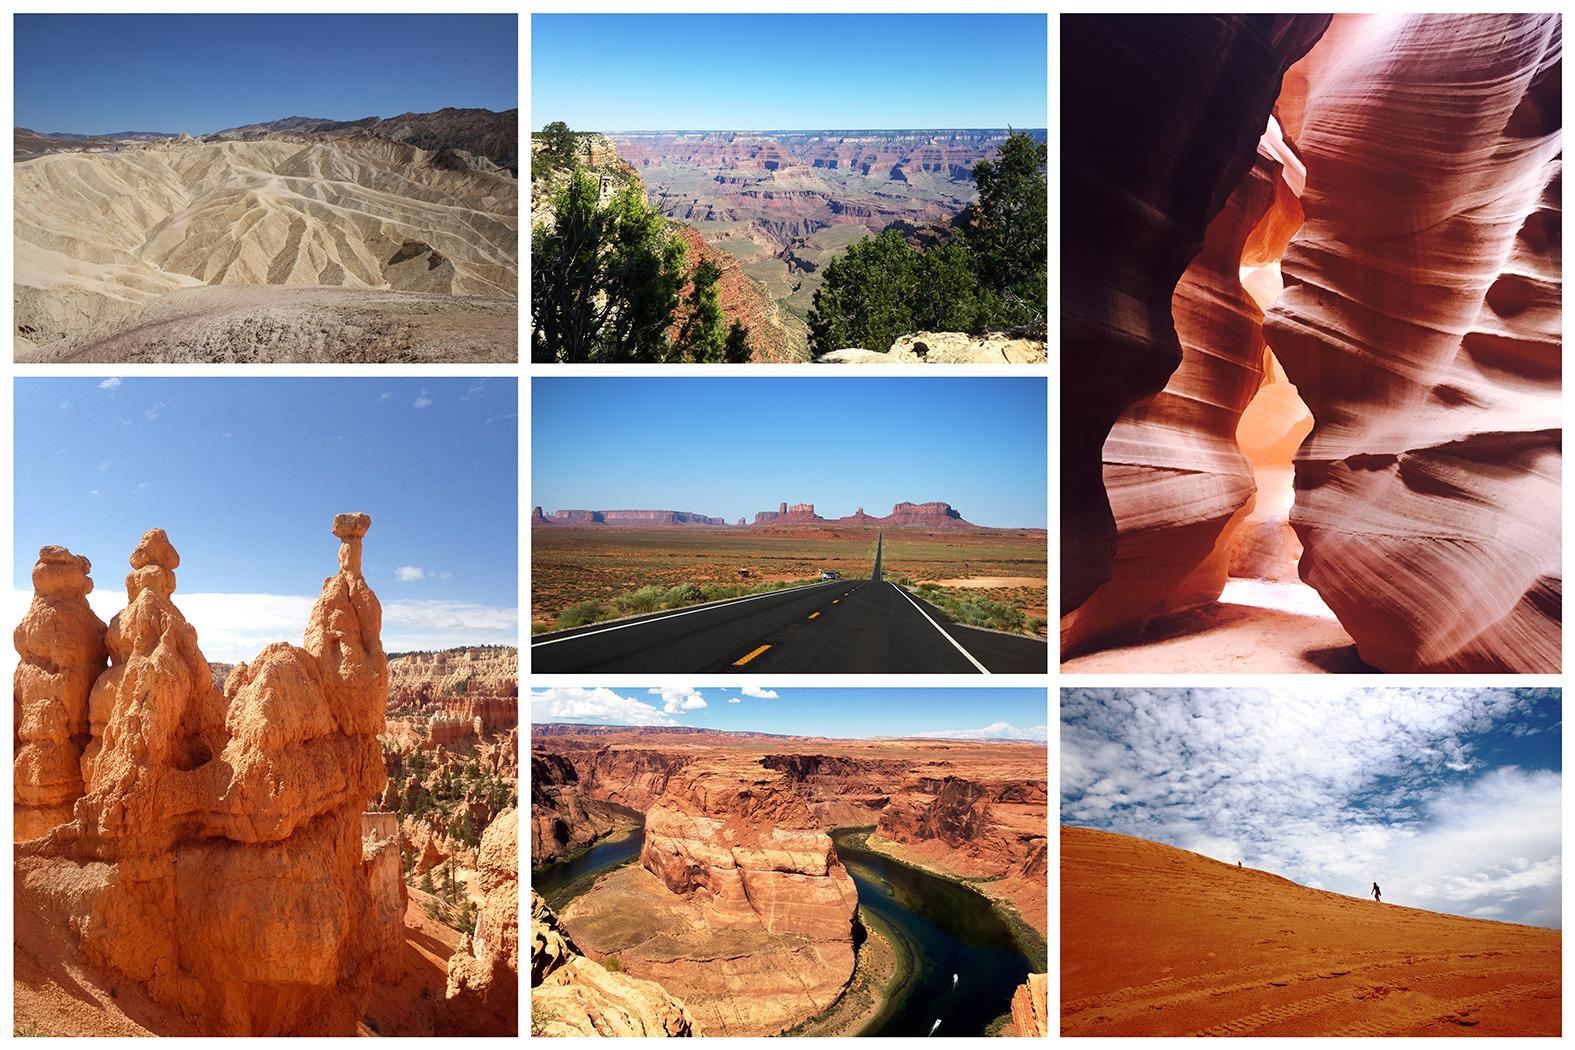 vakantie collage